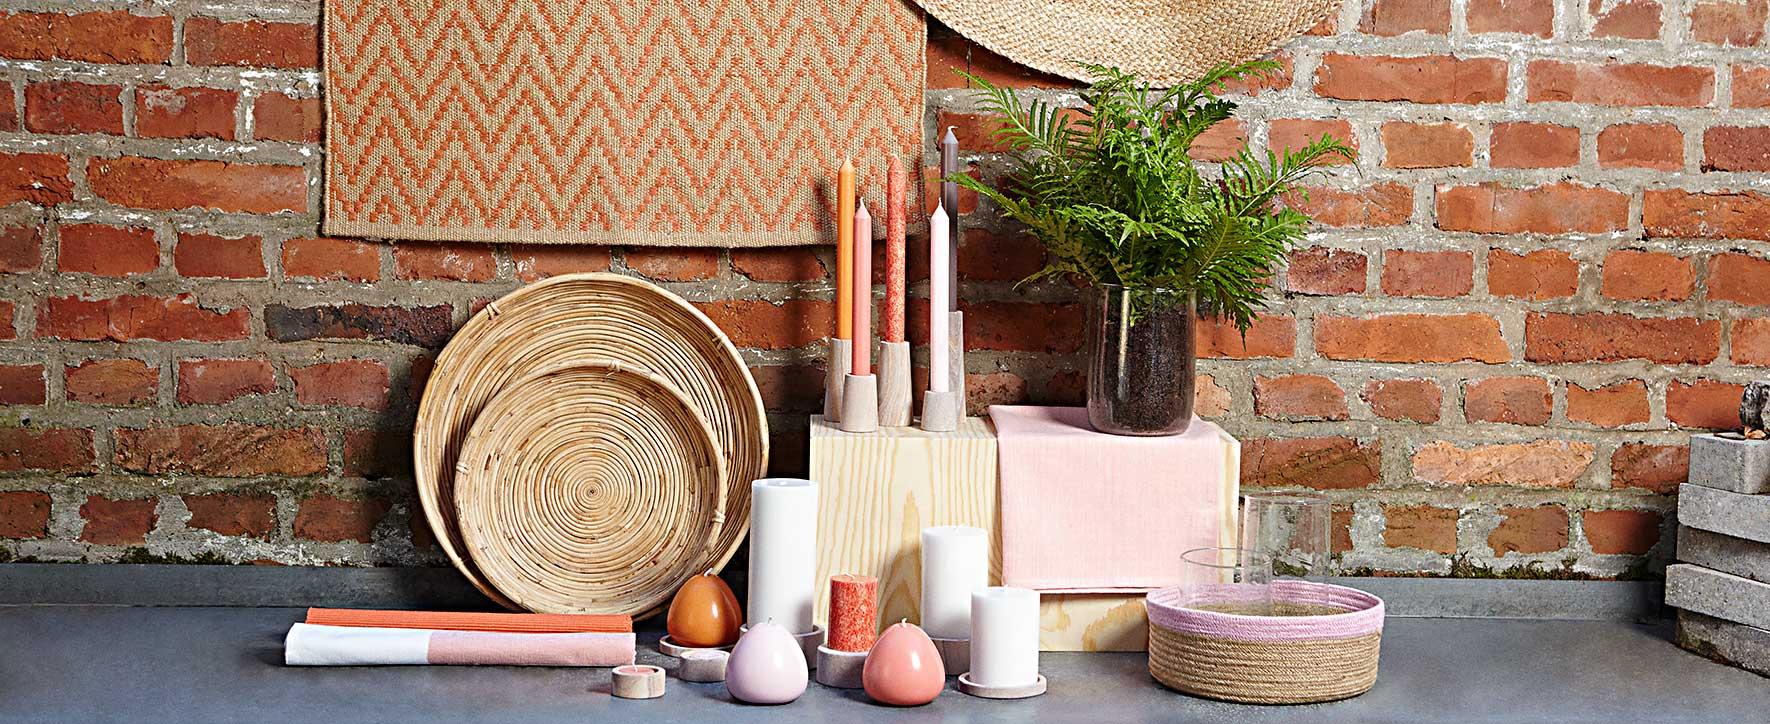 Kollektion Bloom - Foto: GEPA - The Fair Trade Company / Julia von der Heide